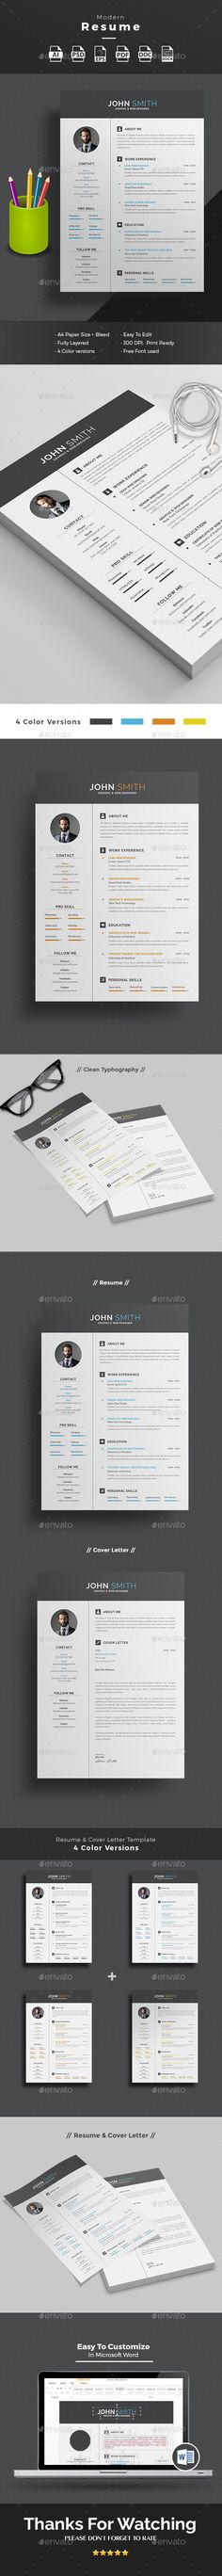 Resume Template PSD, AI Illustrator, MS Word. Download here: https://graphicriver.net/item/resume/17424082?ref=ksioks